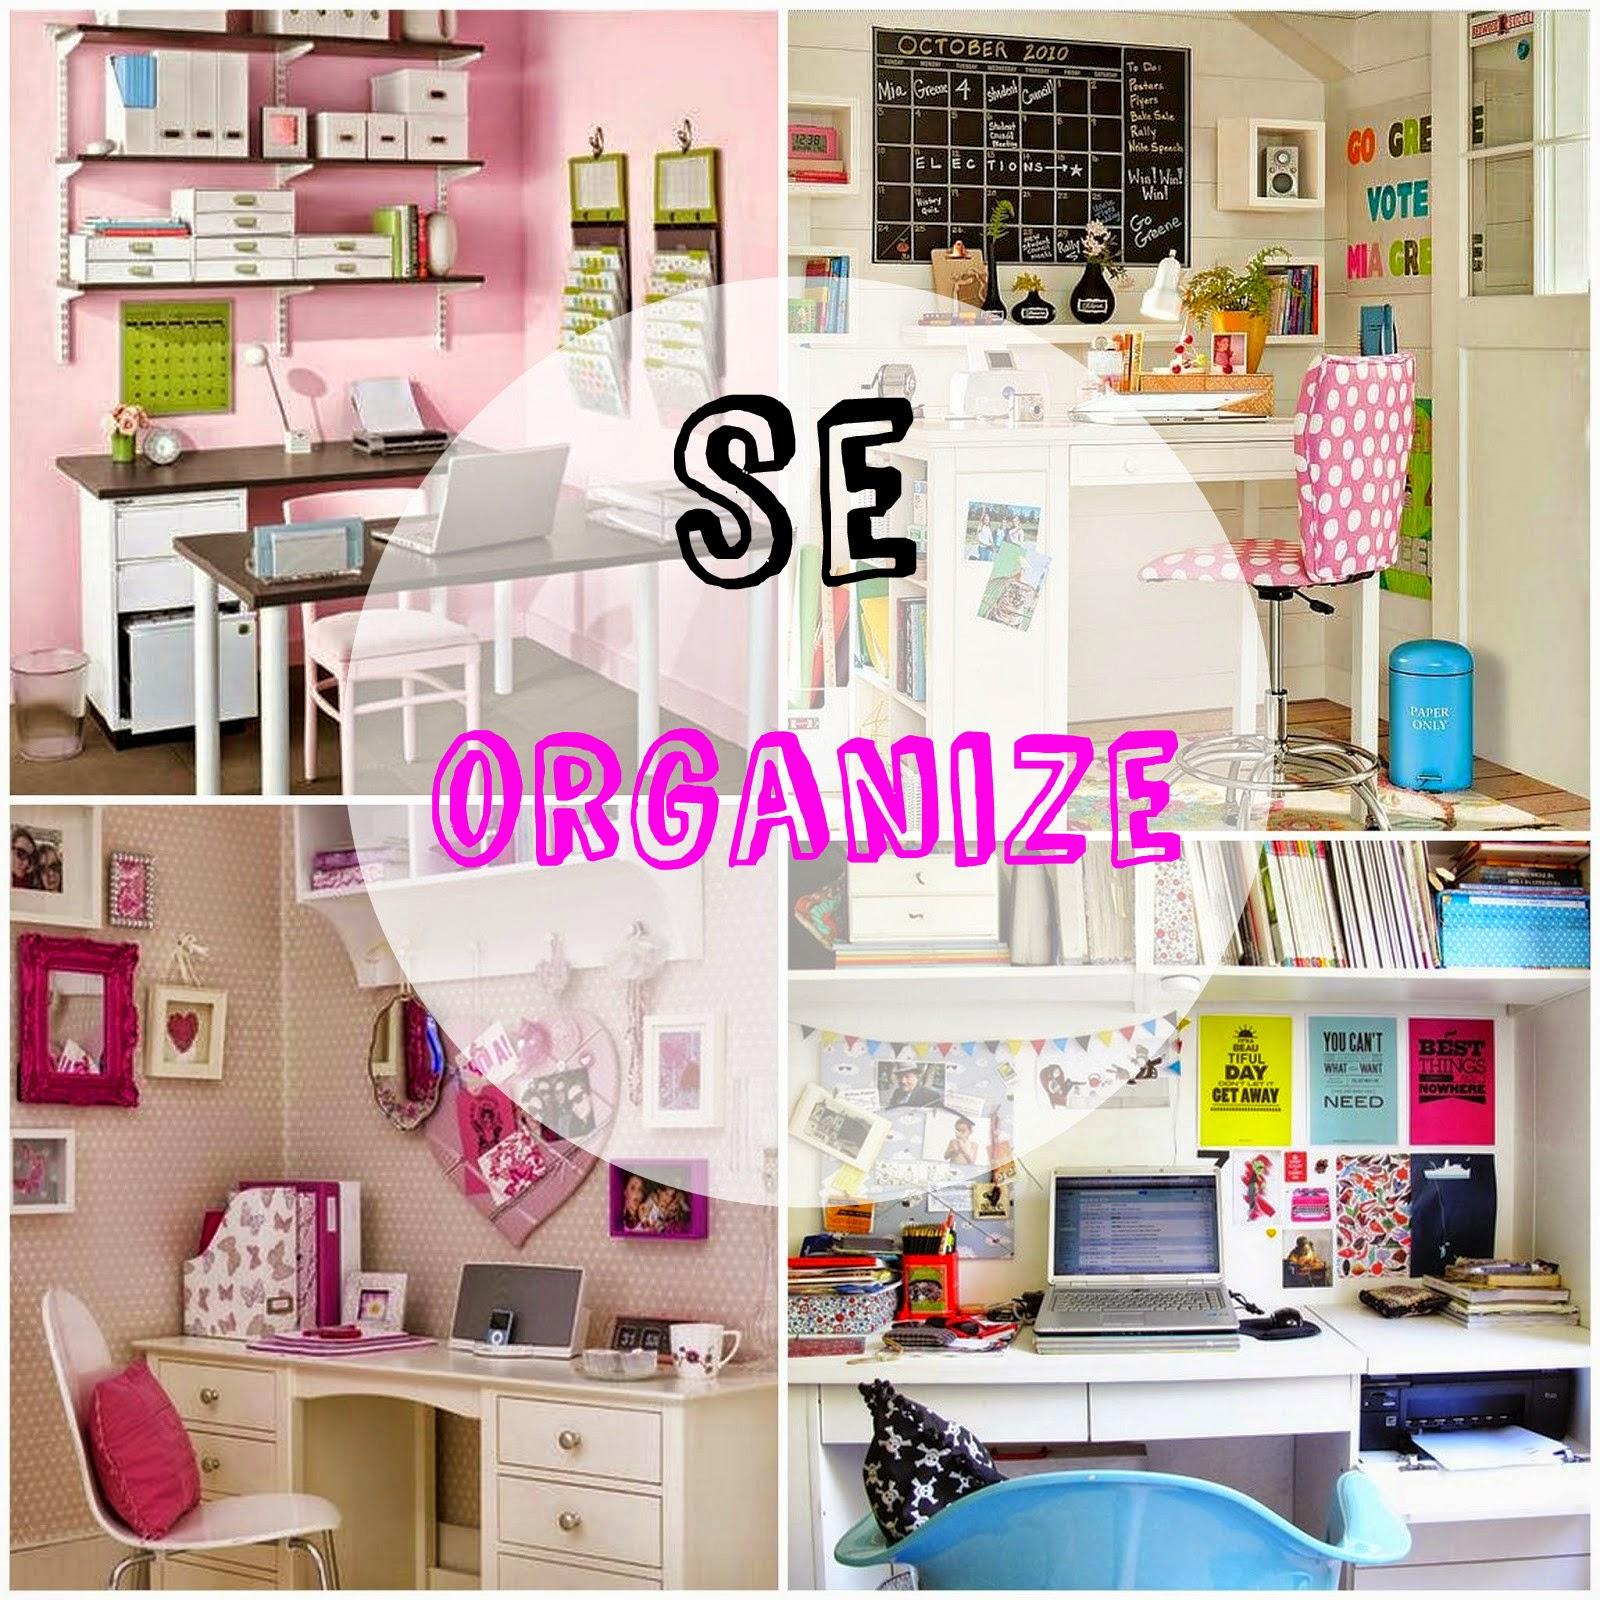 home-office2jgfbbhg.jpg